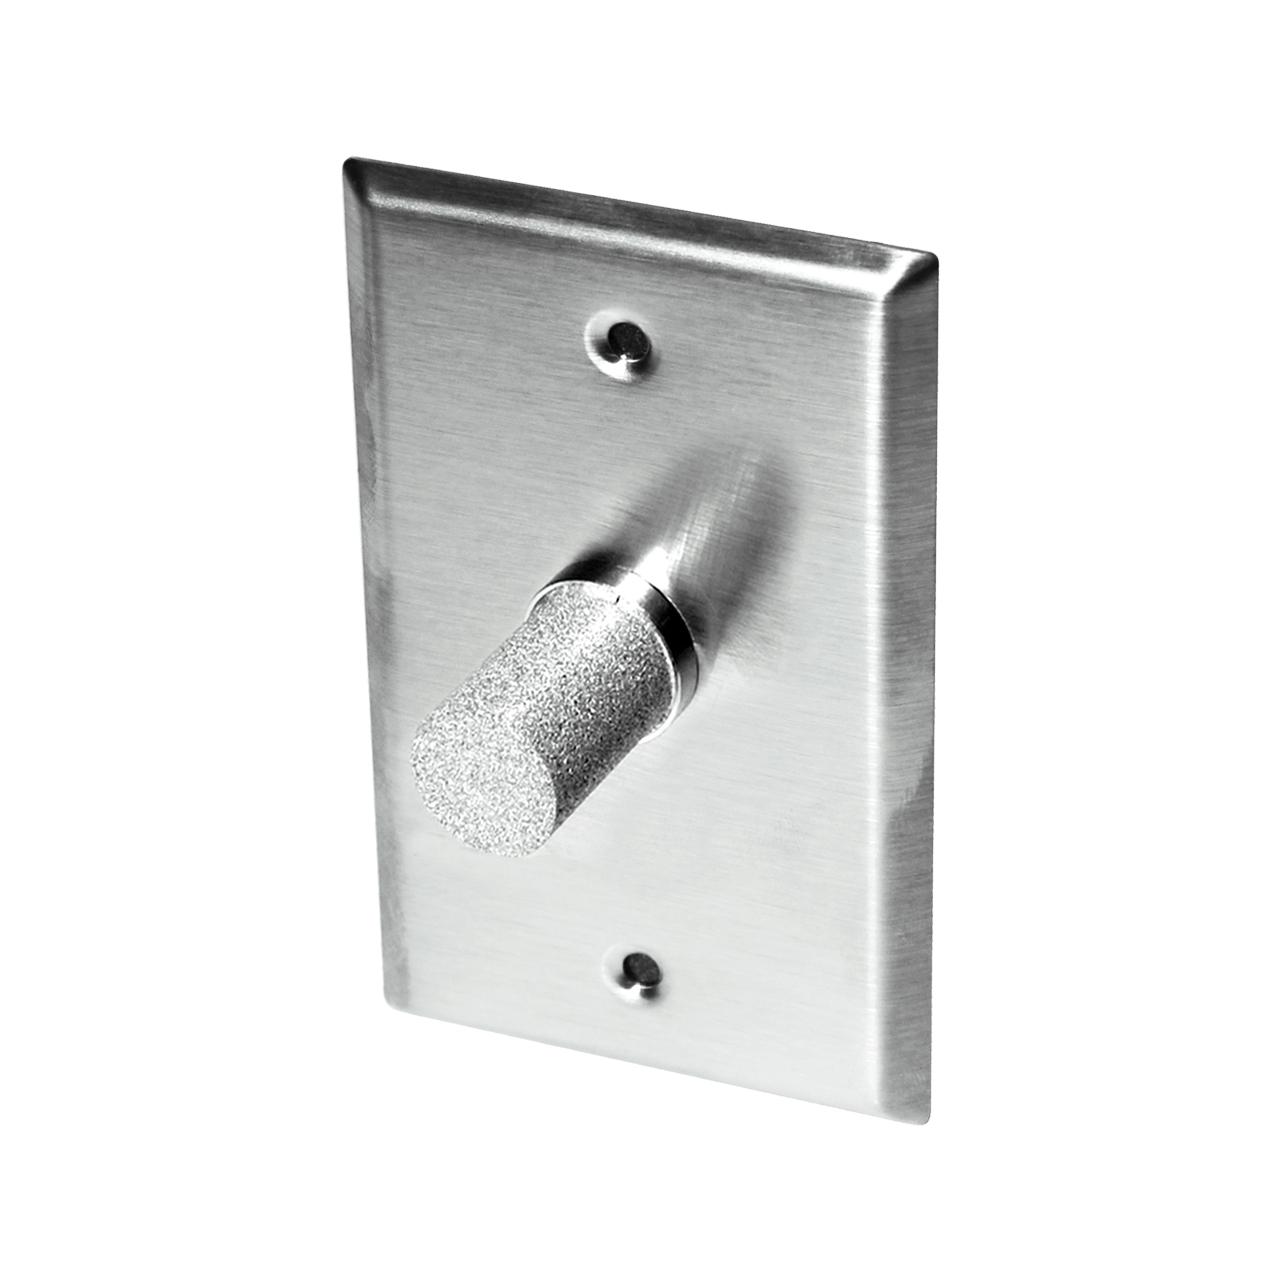 carrier-NSA-3PCT-RH-wall-plate-sensor